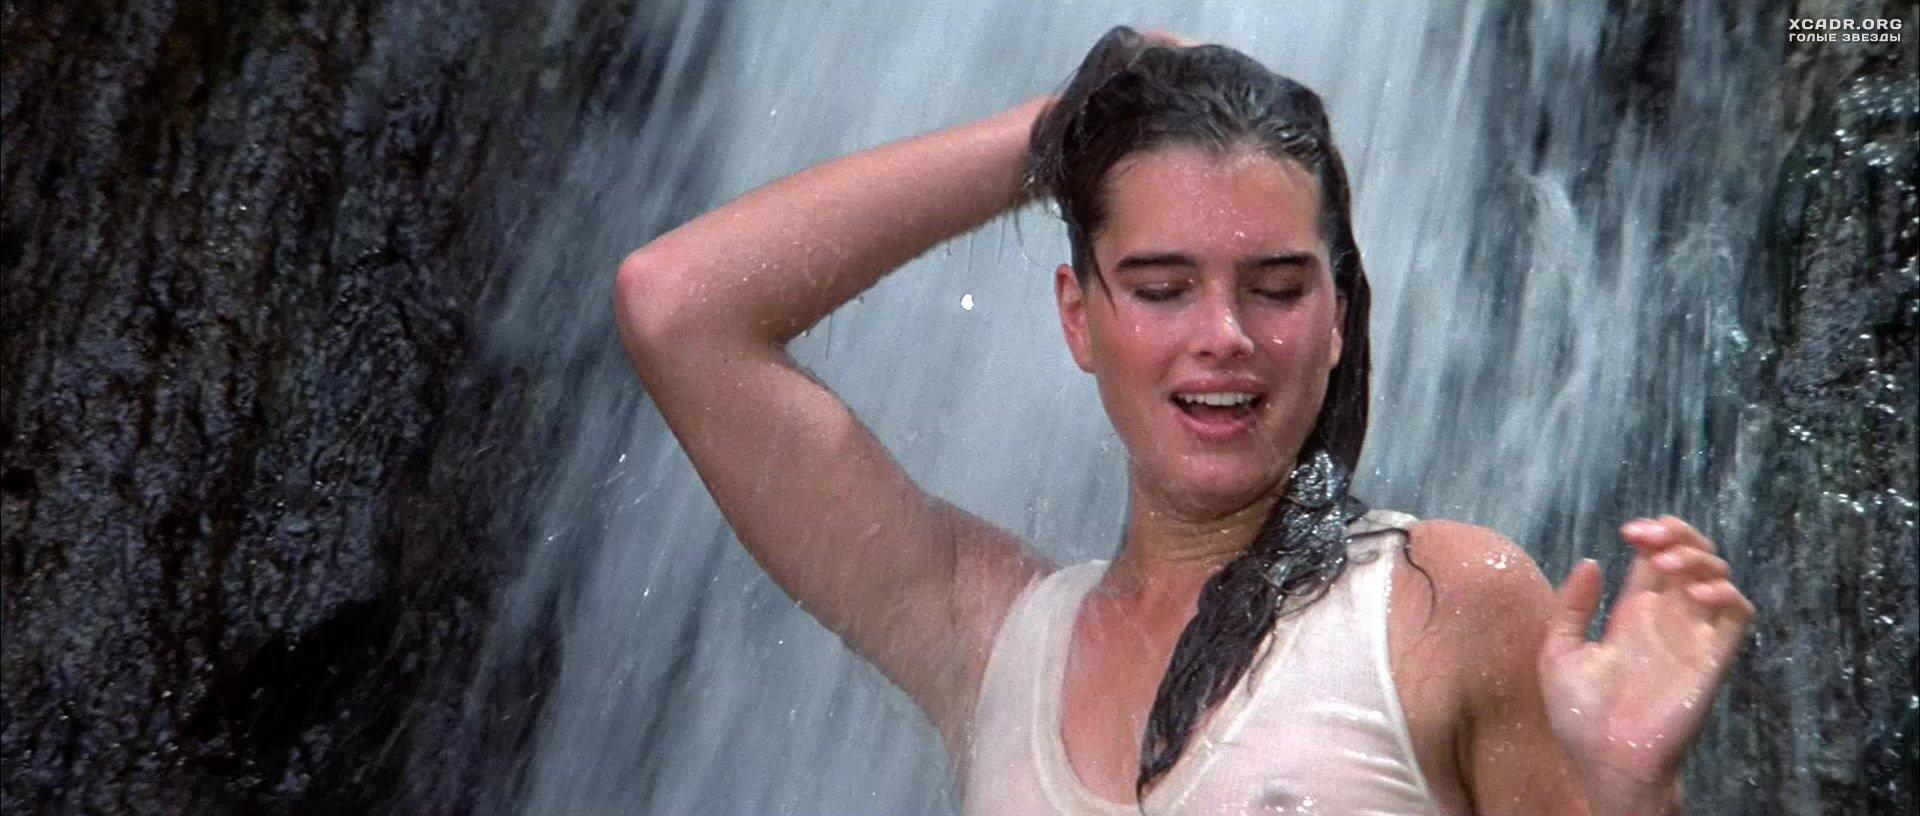 Мокрая Брук Шилдс у водопада – Сахара (1983) | XCADR.COM милла йовович фильмы